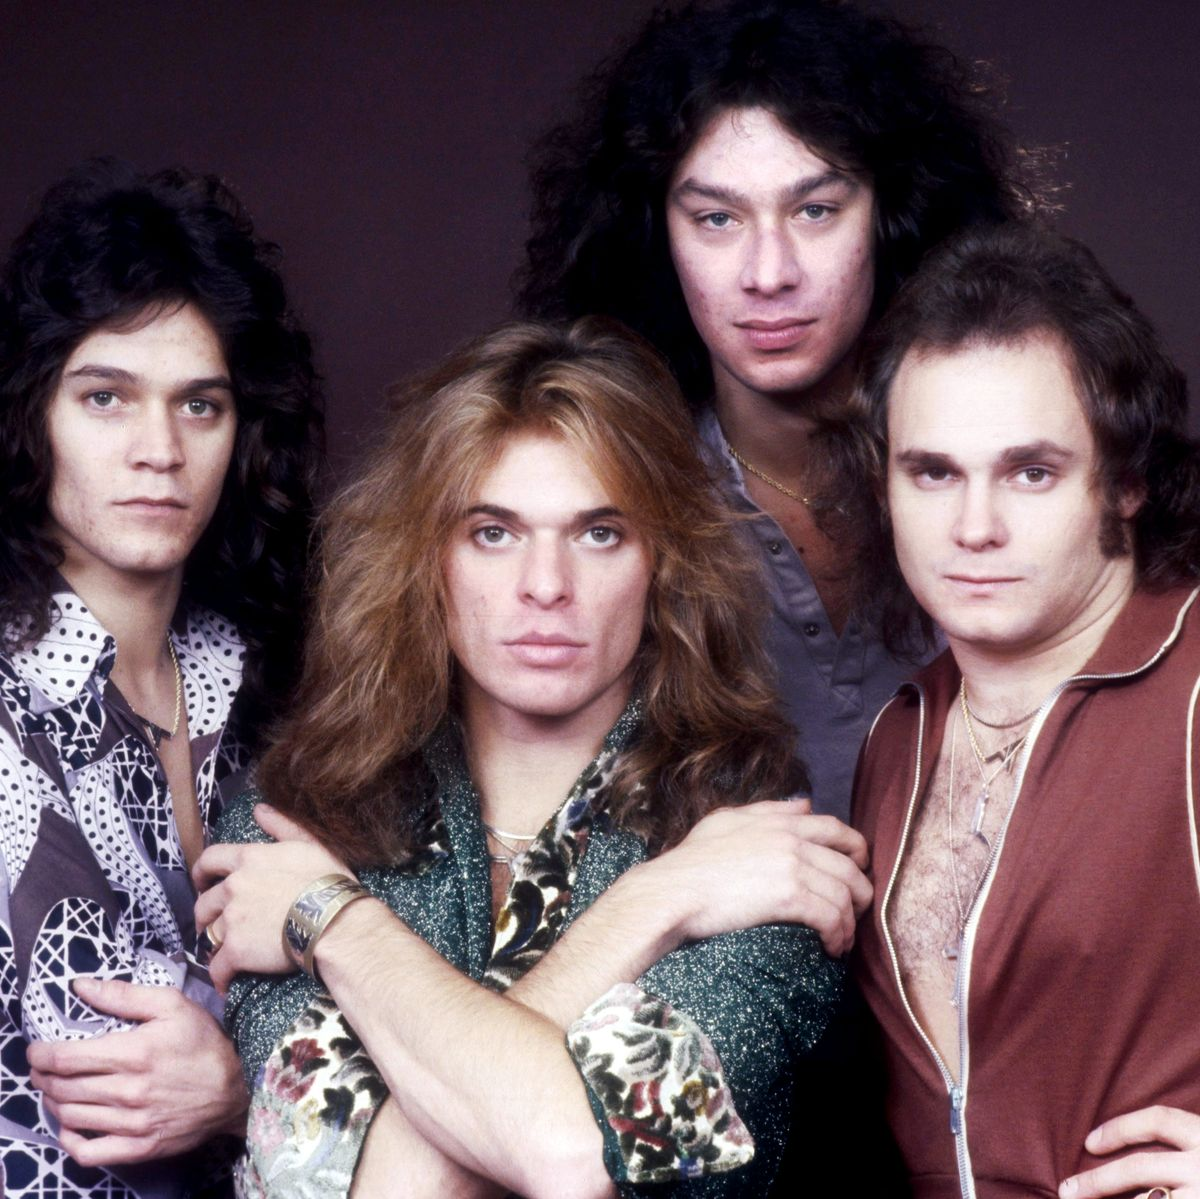 0168cdcf289215fc91eb561eb0338da820 04 van halen ranking.rsquare.w1200 20 Facts About Rock Legends Van Halen That Will Make You Jump